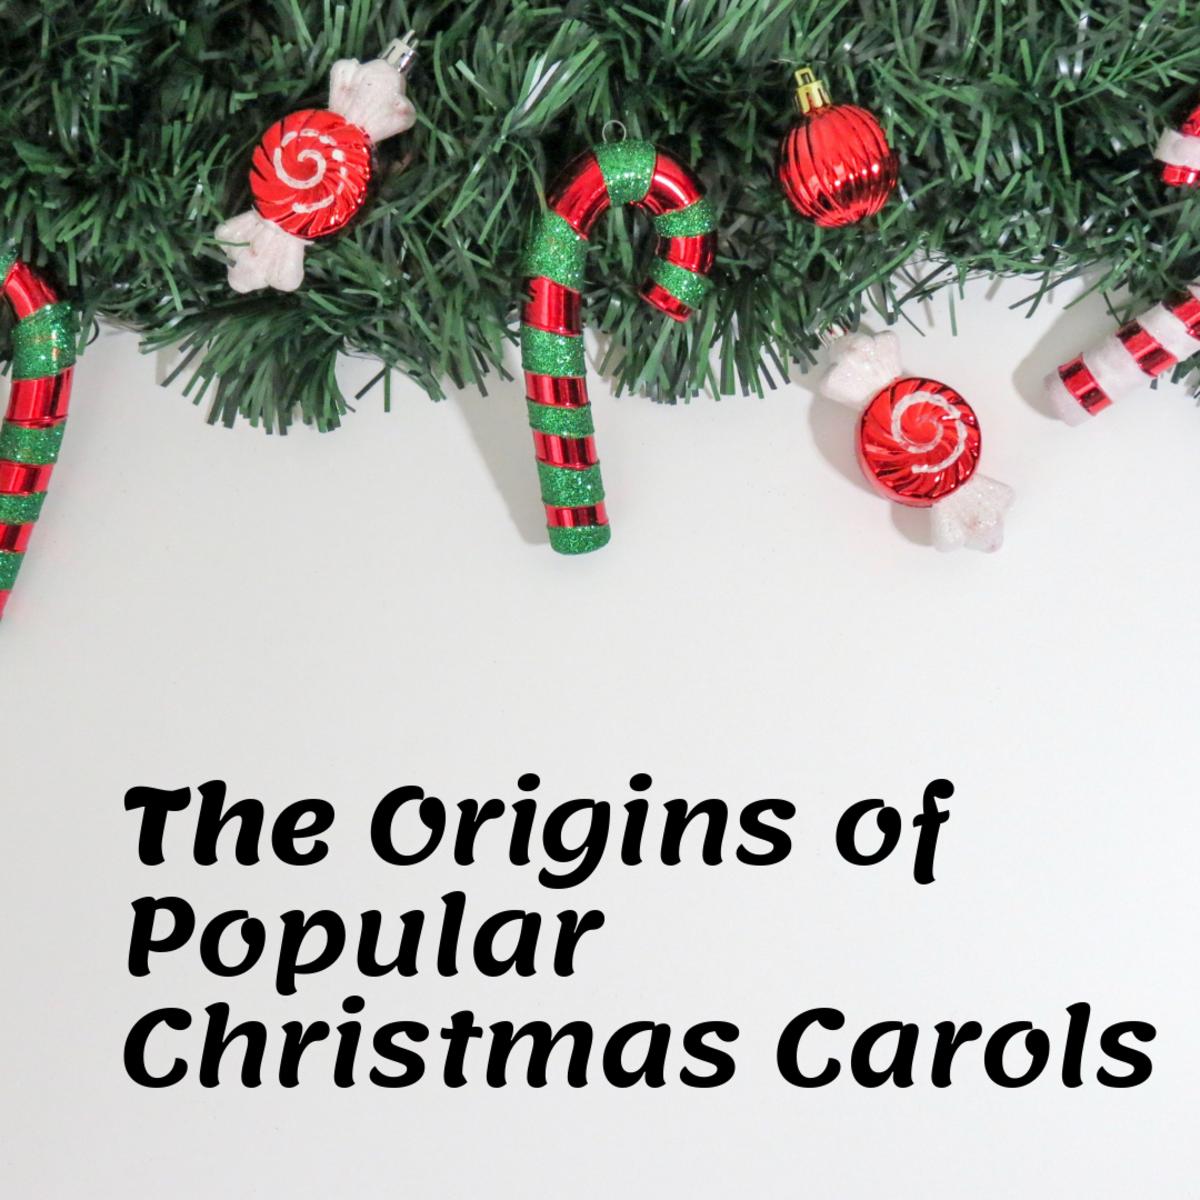 Origins of Popular Christmas Carols